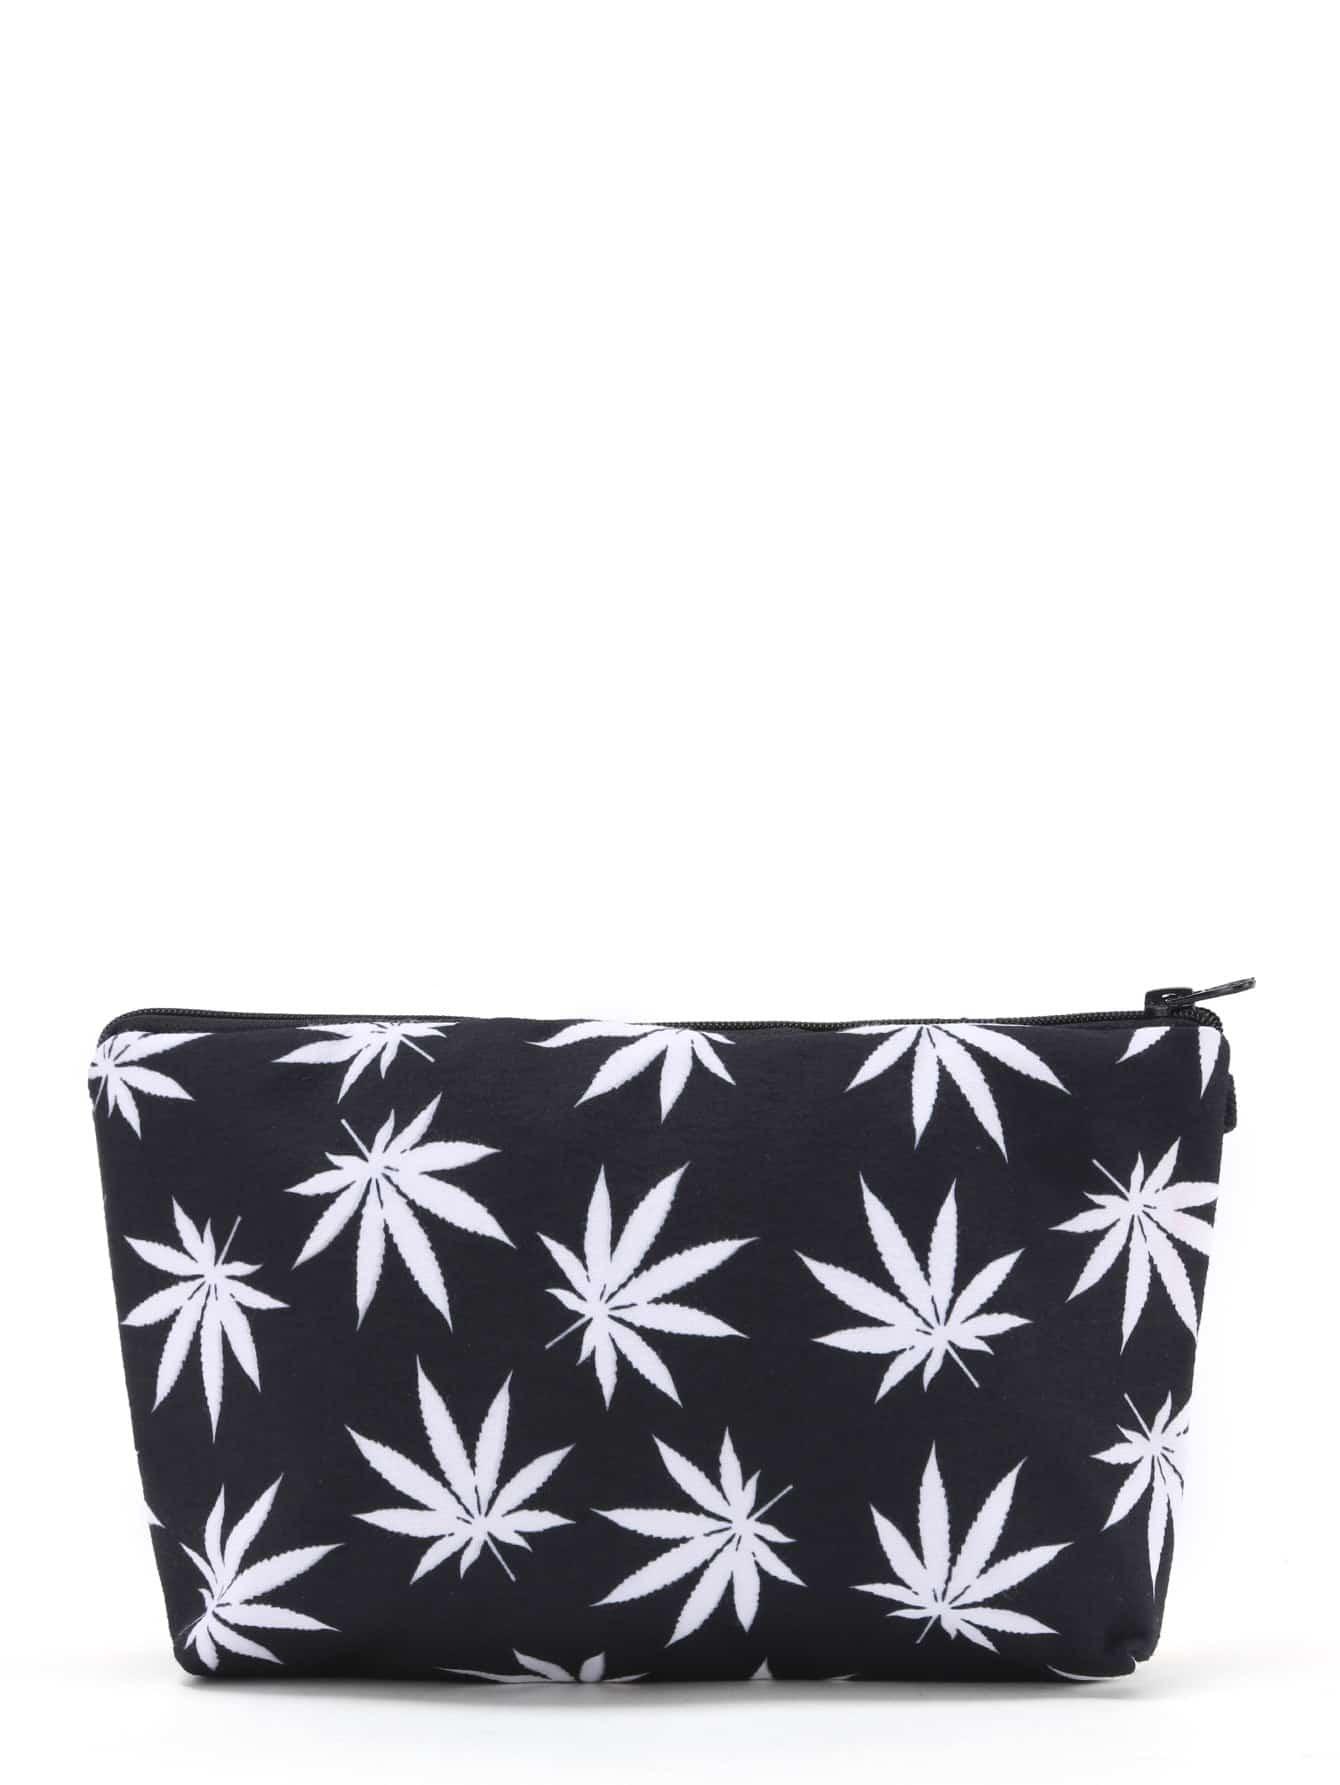 Maple Leaf Print Zipper Pouch